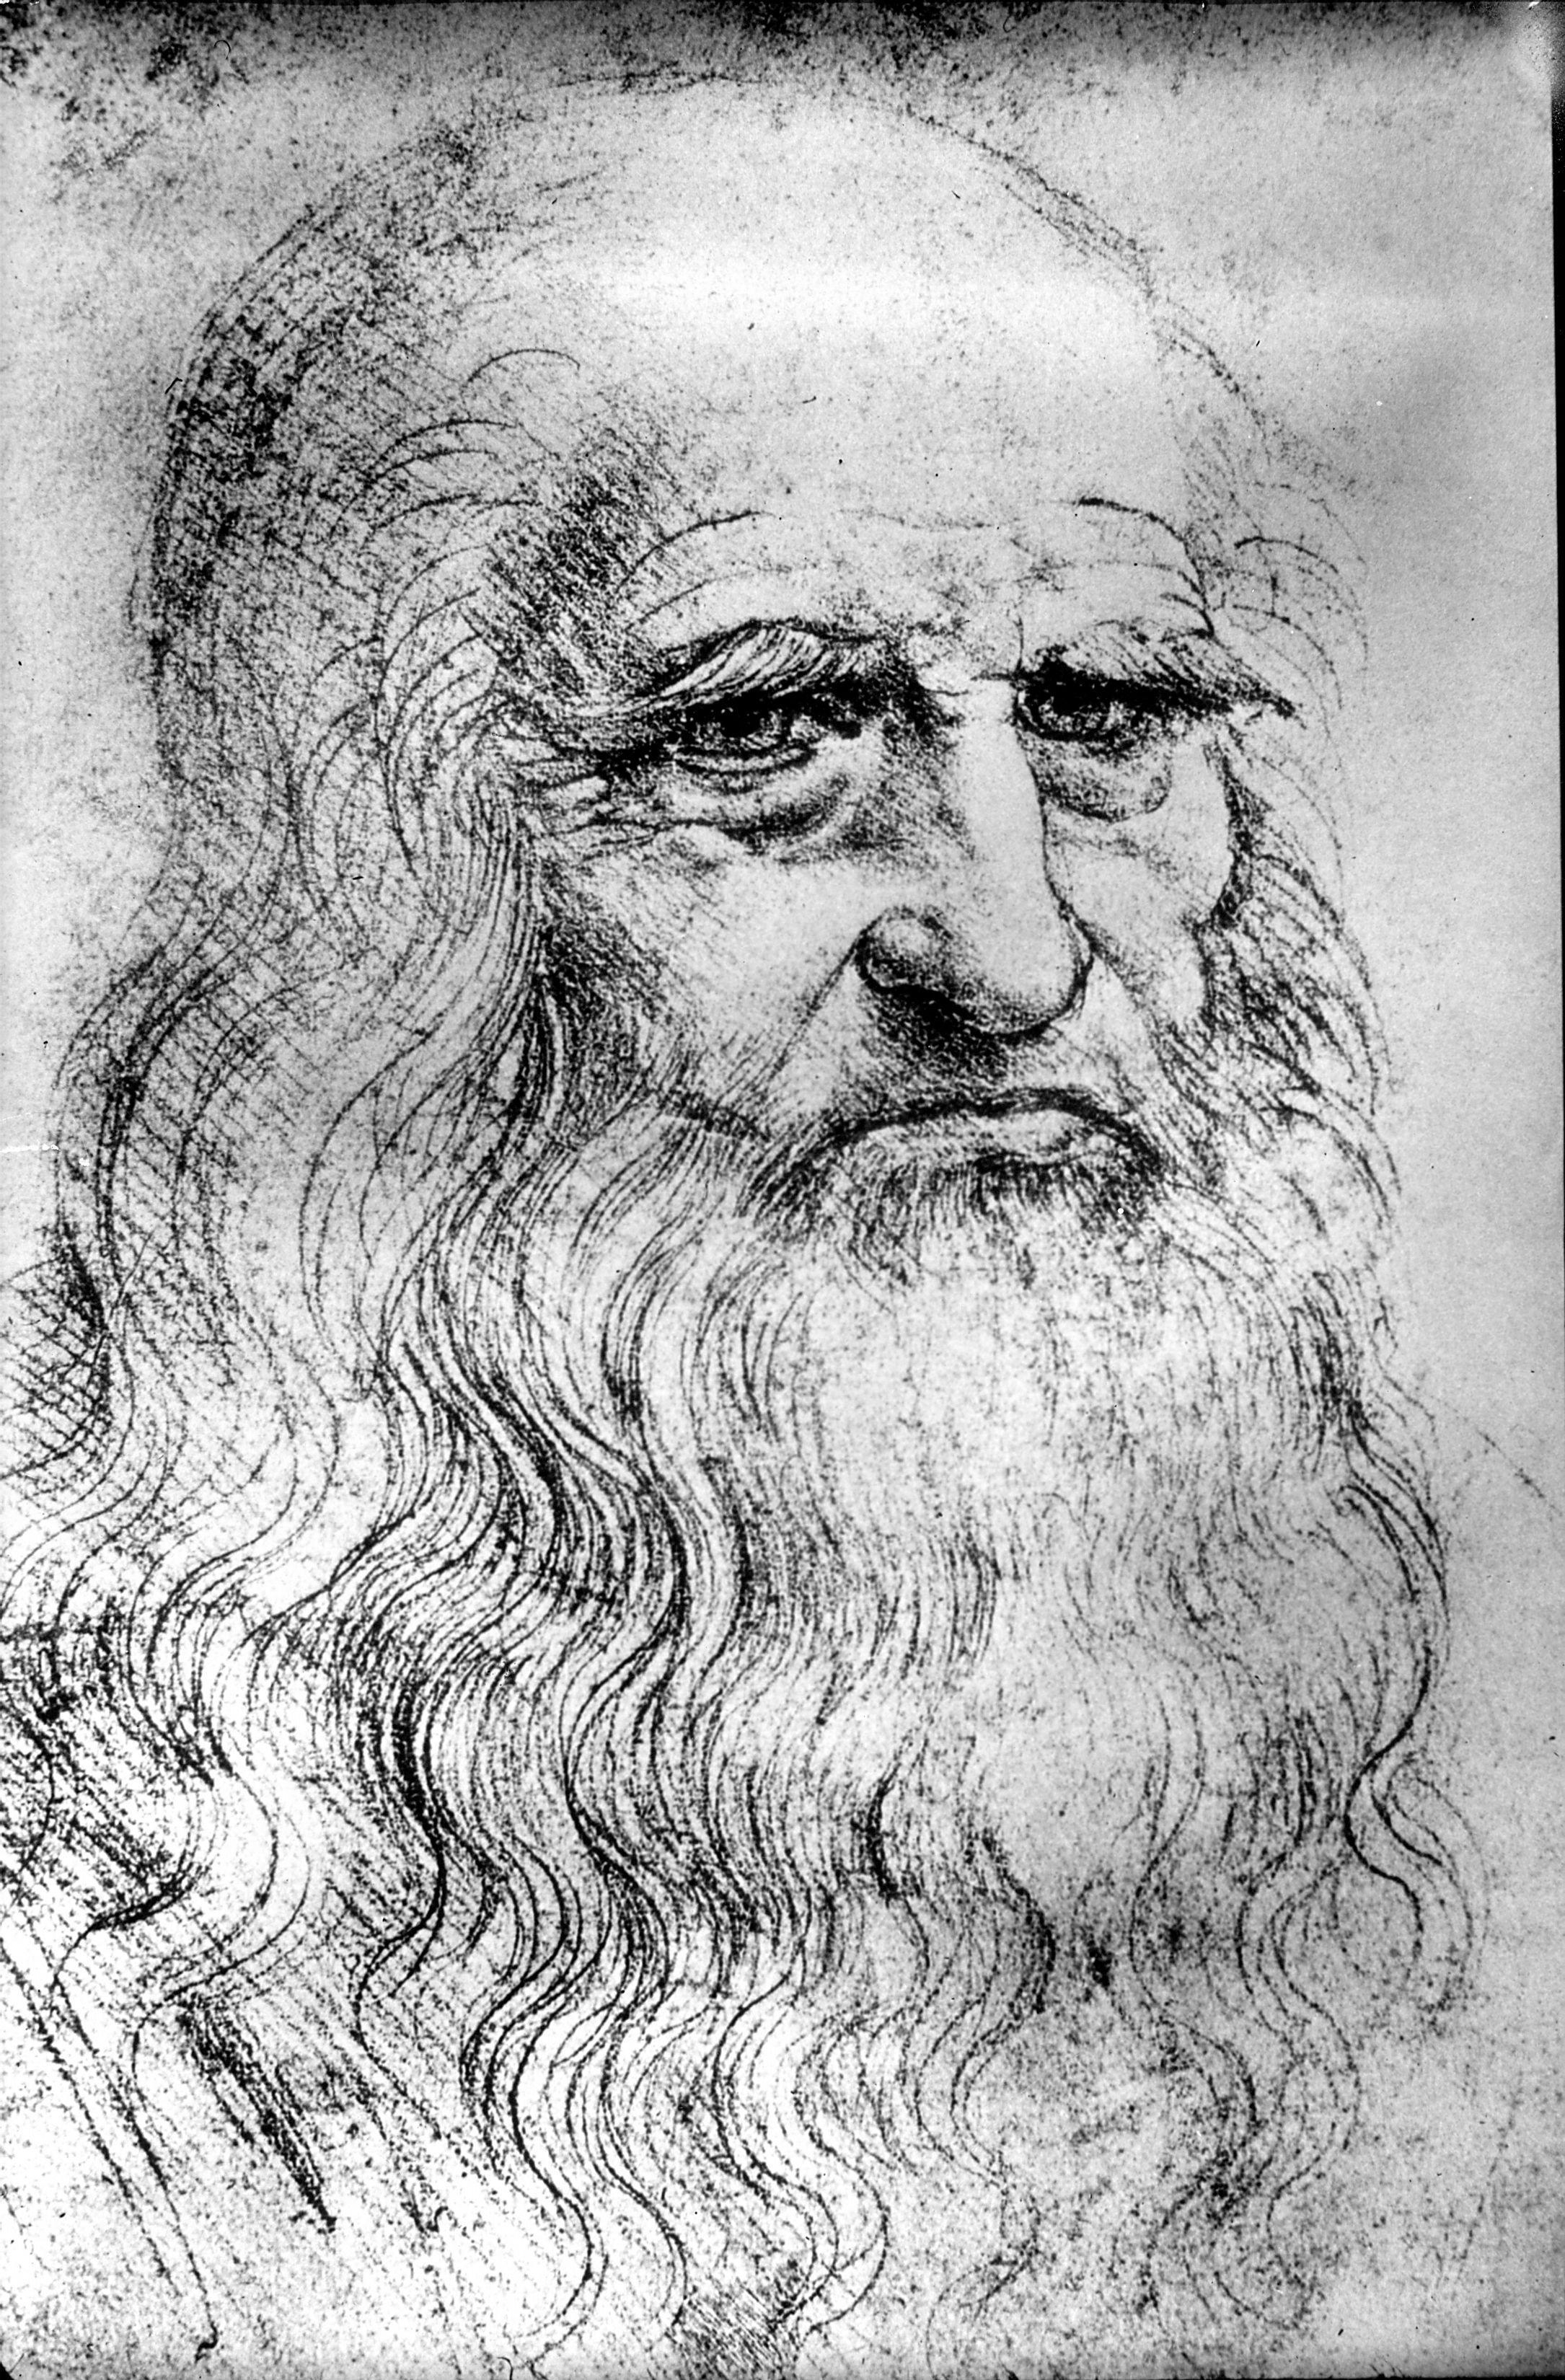 Biography of Leonardo da Vinci. Leonardo da Vinci: interesting facts of life, achievements 41